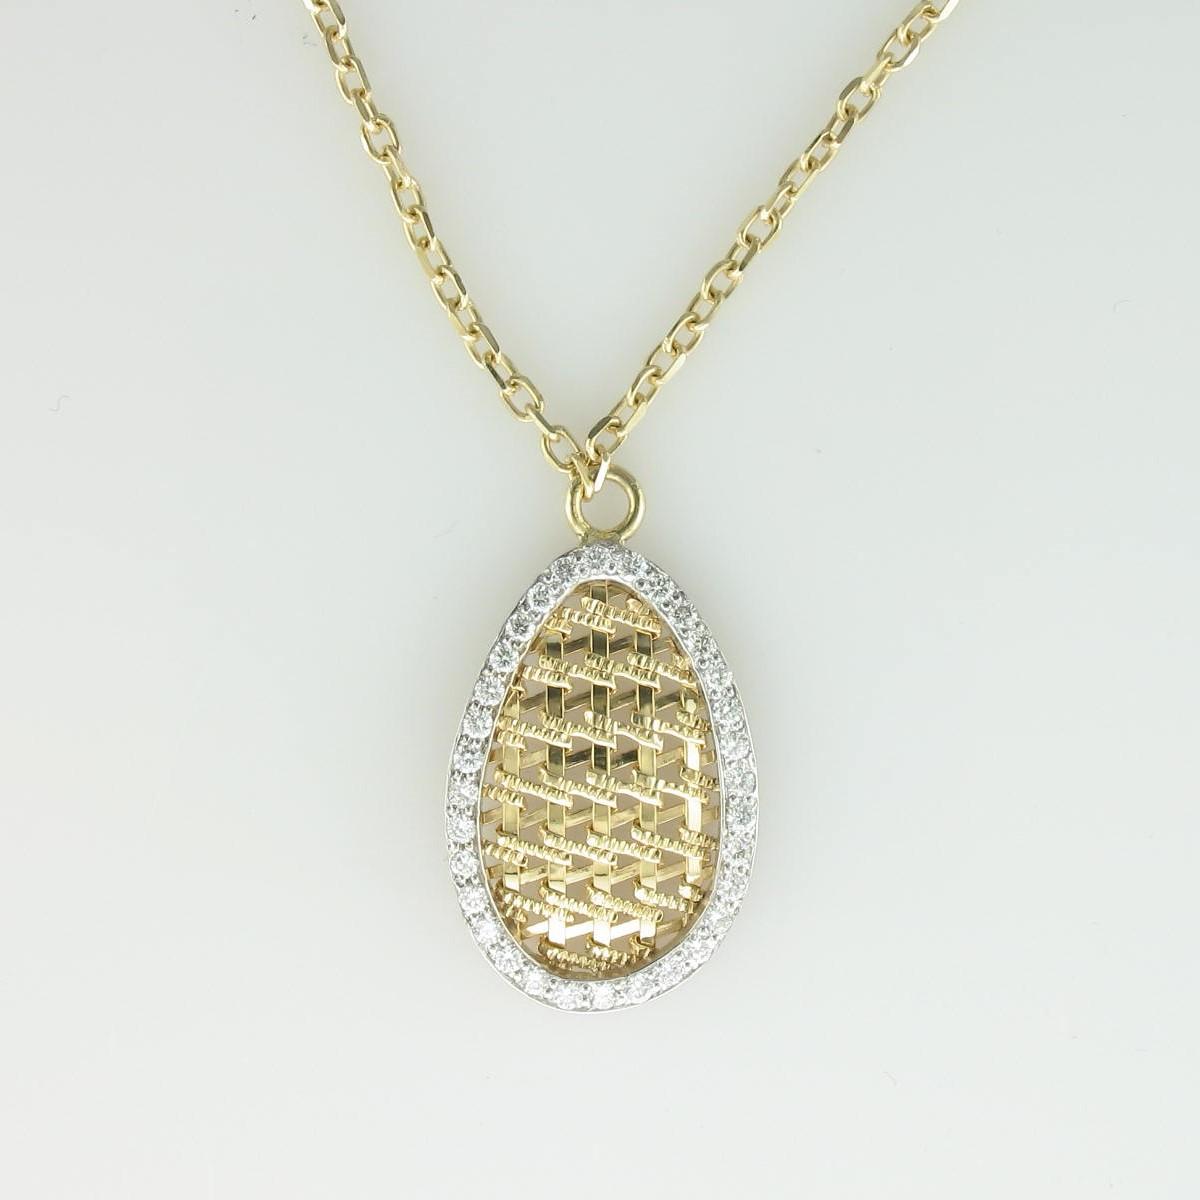 0.45tcw Diamond Necklace Set in 14 Karat Yellow Gold